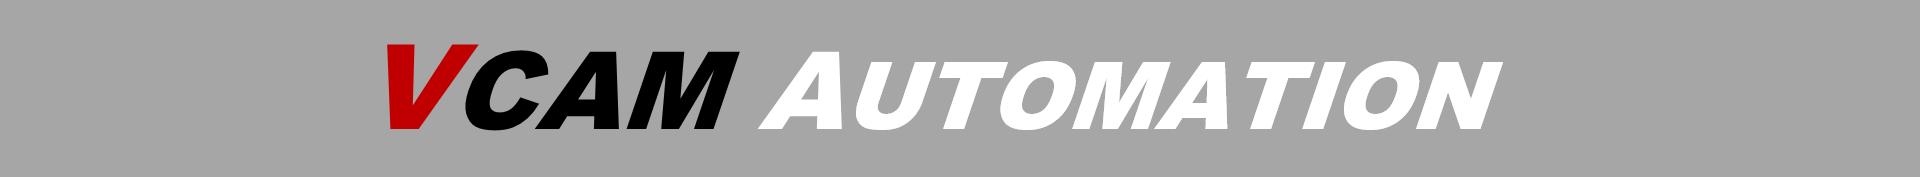 VCAM Automation